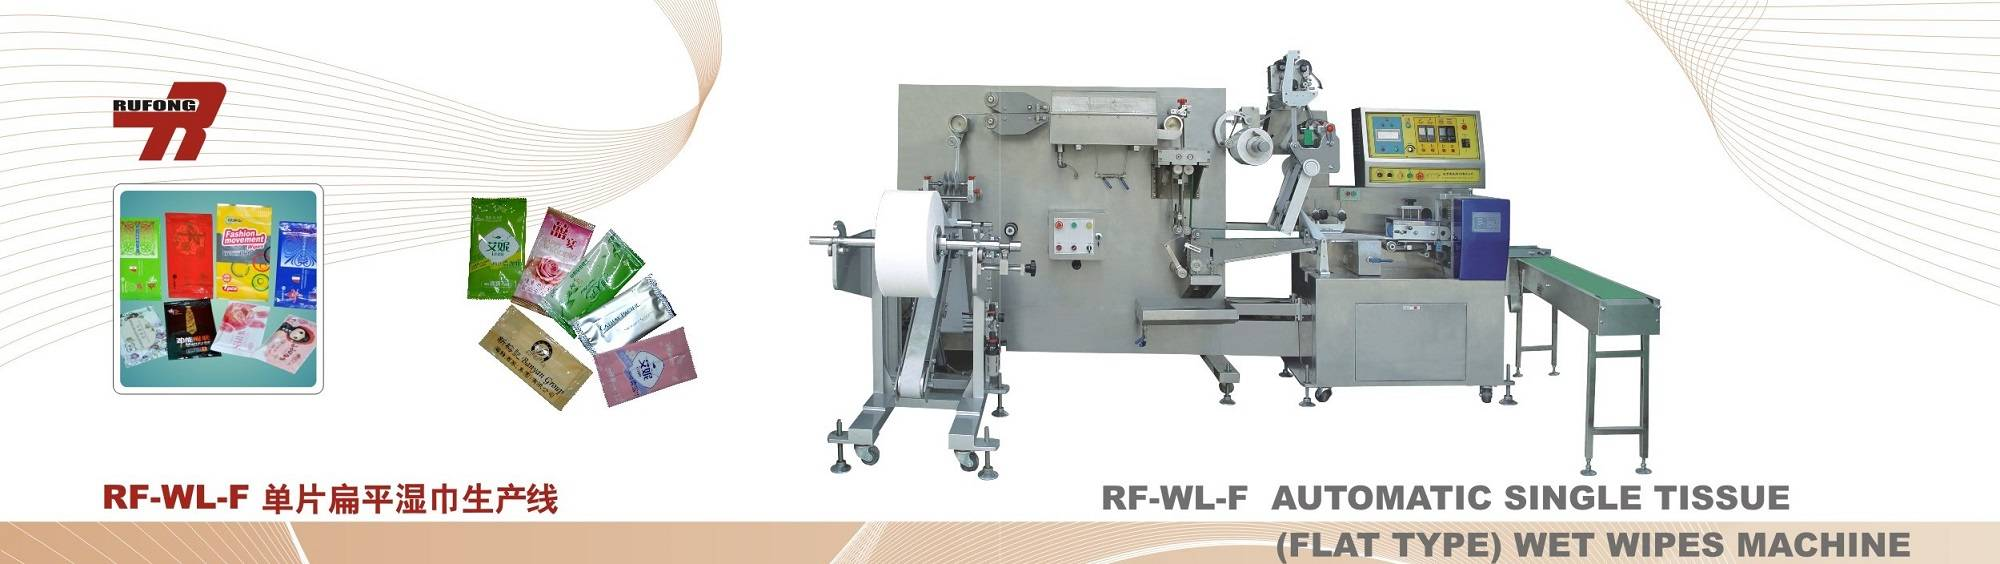 RF-WL-F Automatic Single Tissue (Flat Type) Wet Wipes Machine